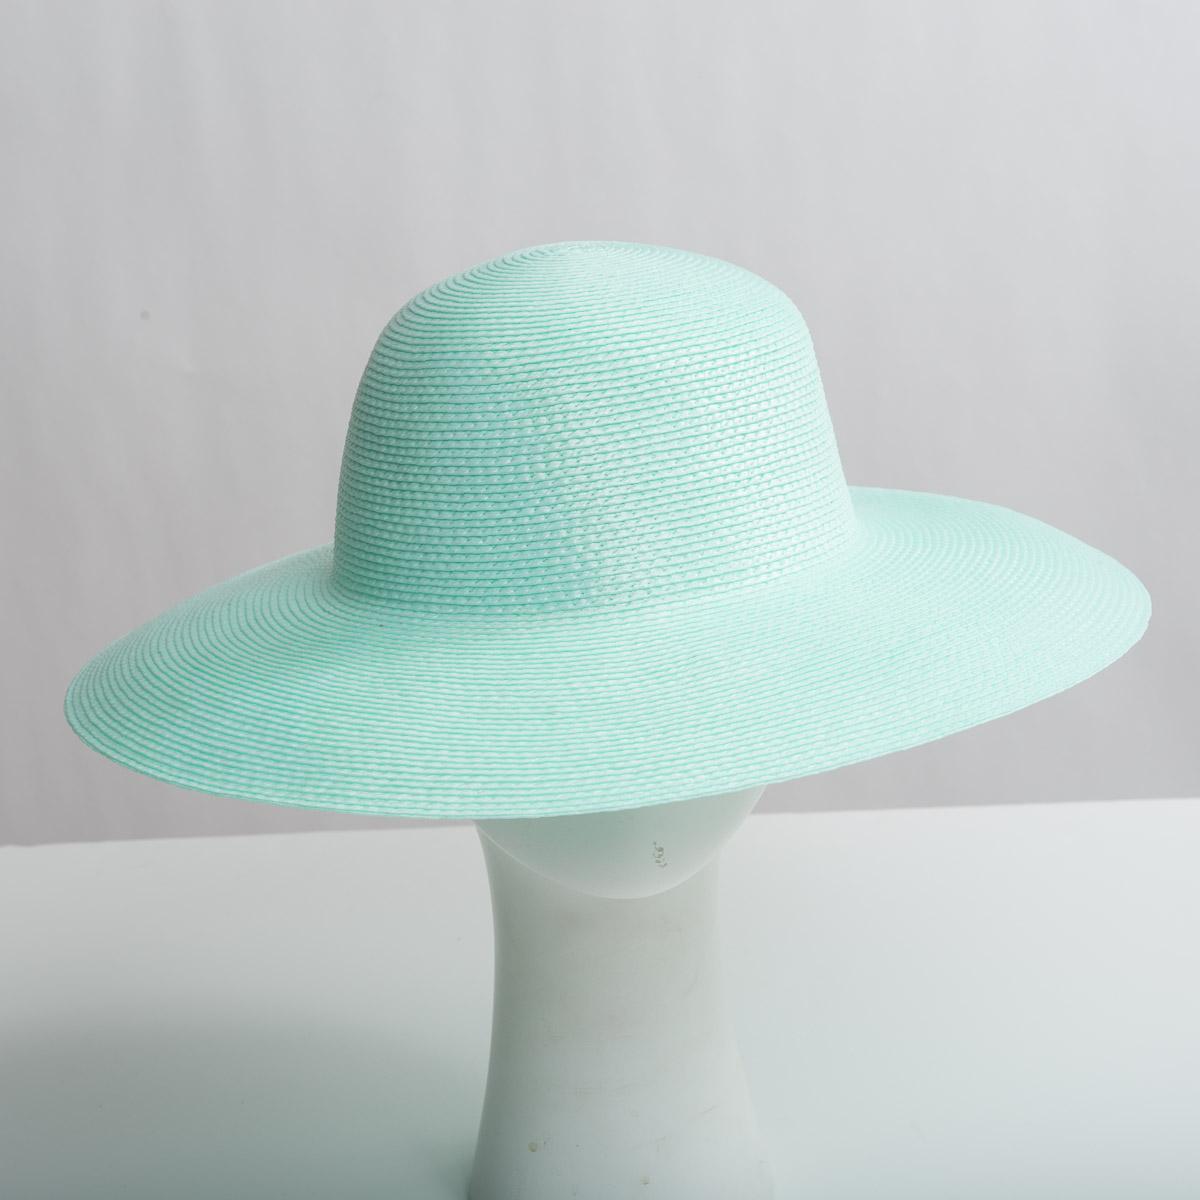 623a1acf6089ef Mint Green Medium Brim Blocked Untrimmed Poly Straw Hat Base-Sun Yorkos |  KaKyco Accessories